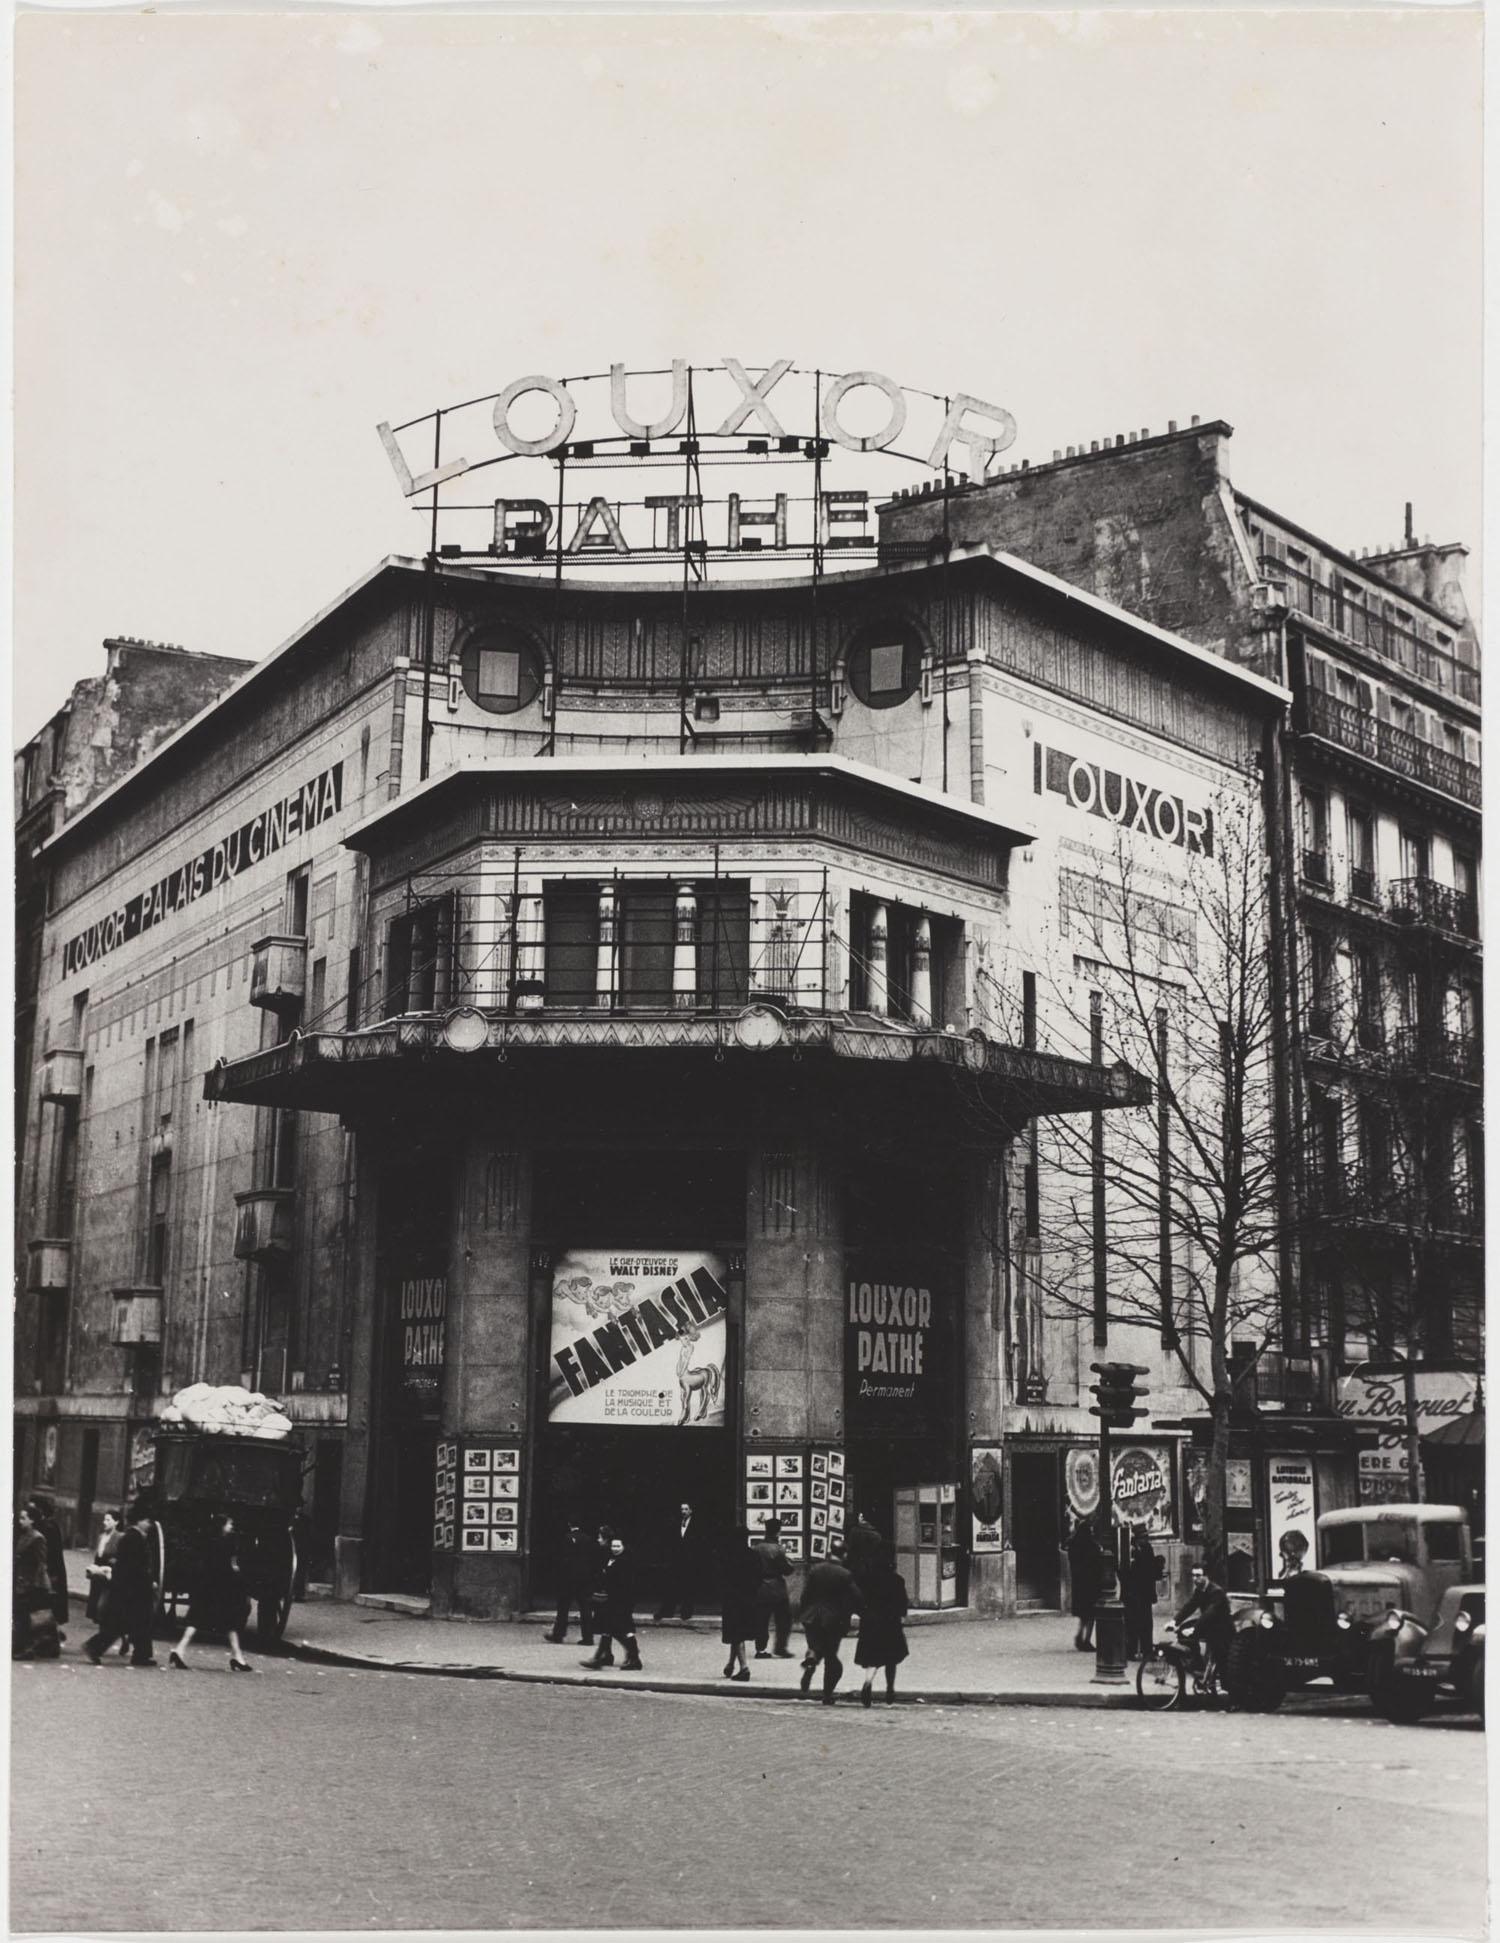 Louxor, semaine du 19 au 25 mars 1947